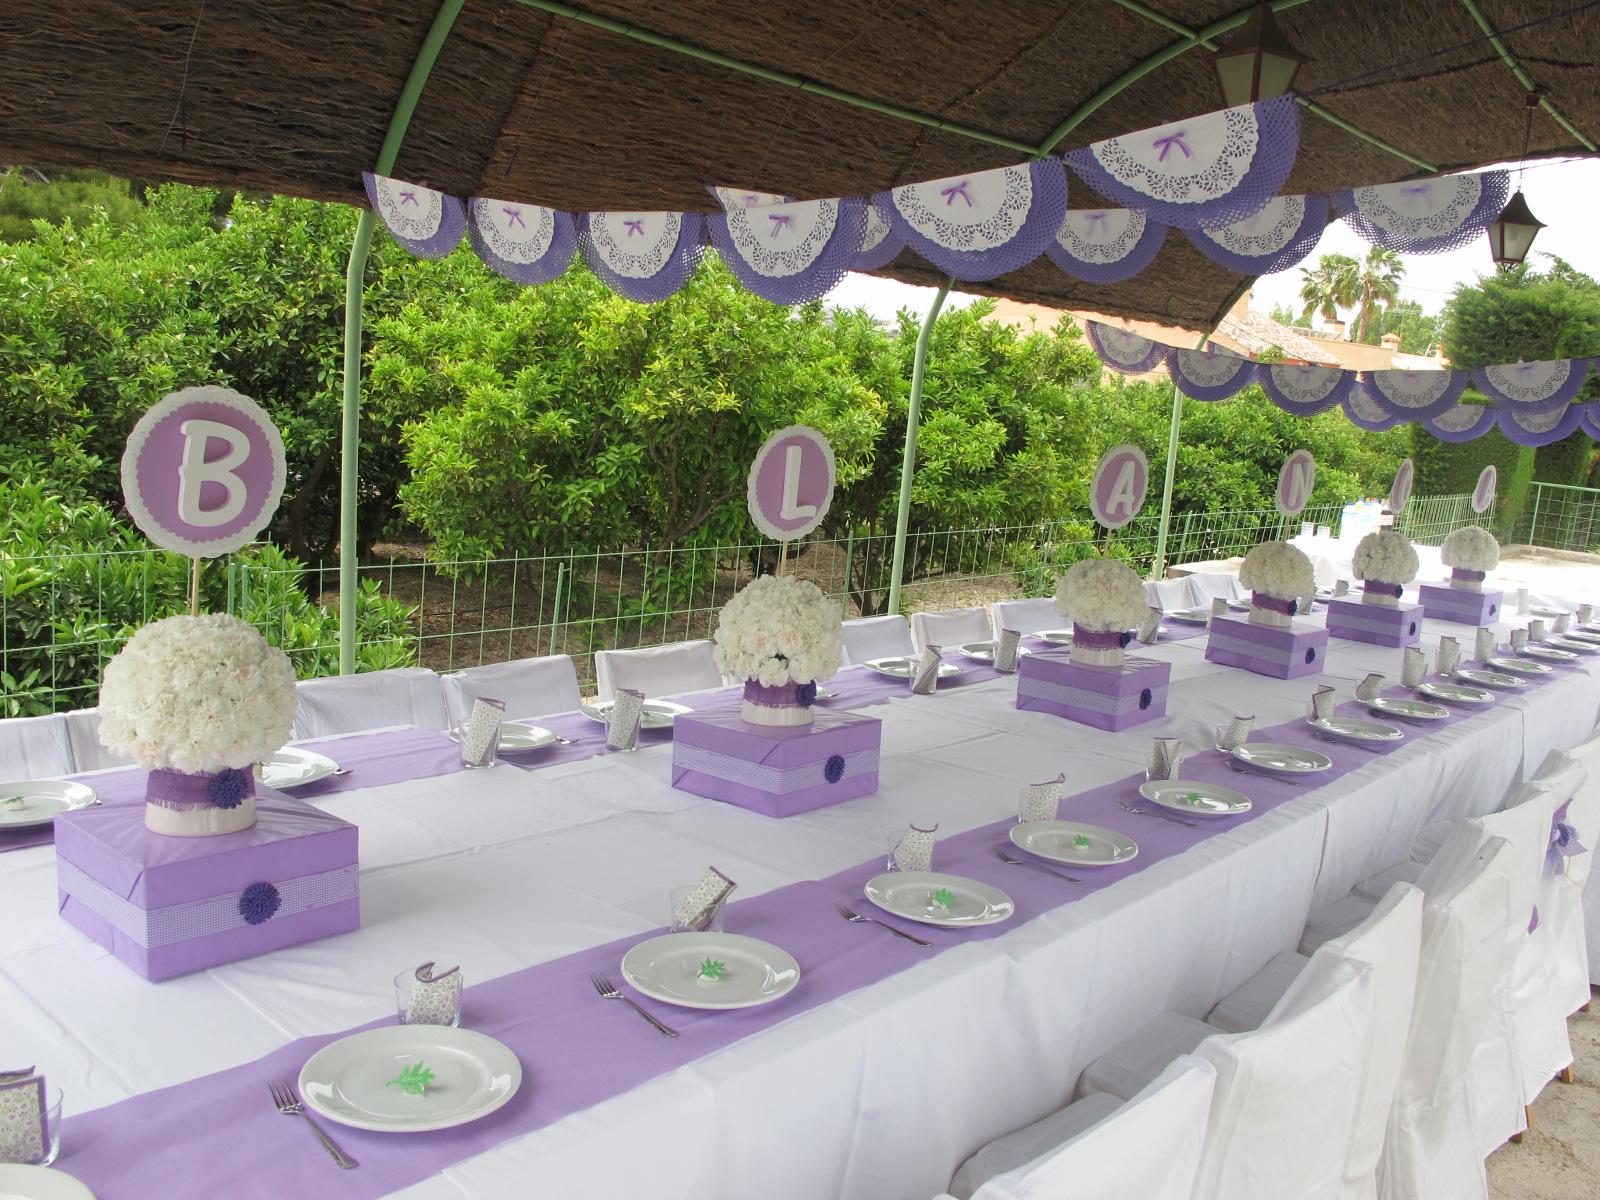 Cumpli2 1 comuni n de blanca - Mesas decoradas para comunion ...